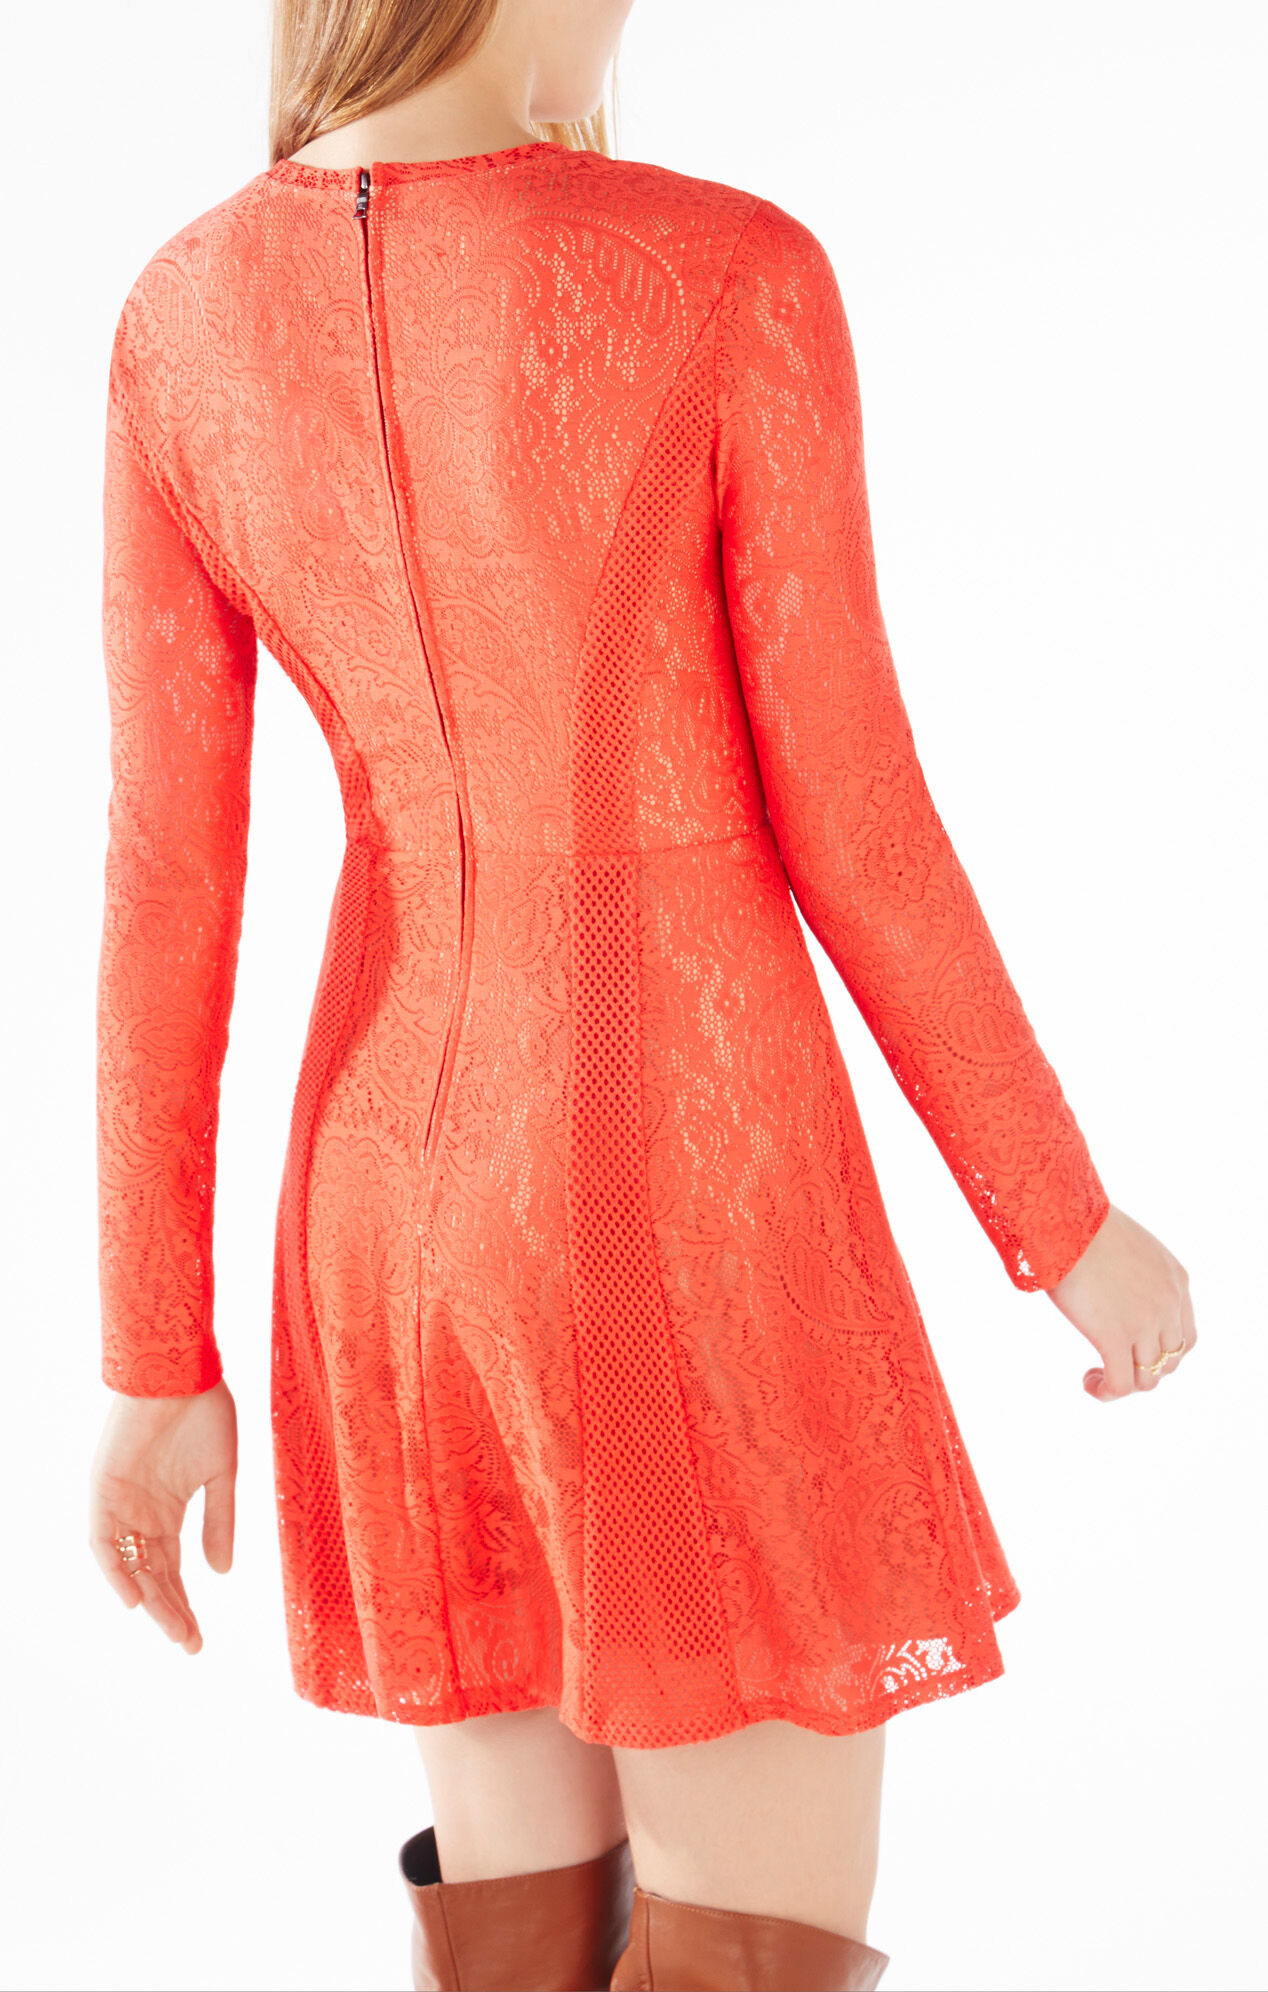 Baylie Paisley Lace Dress